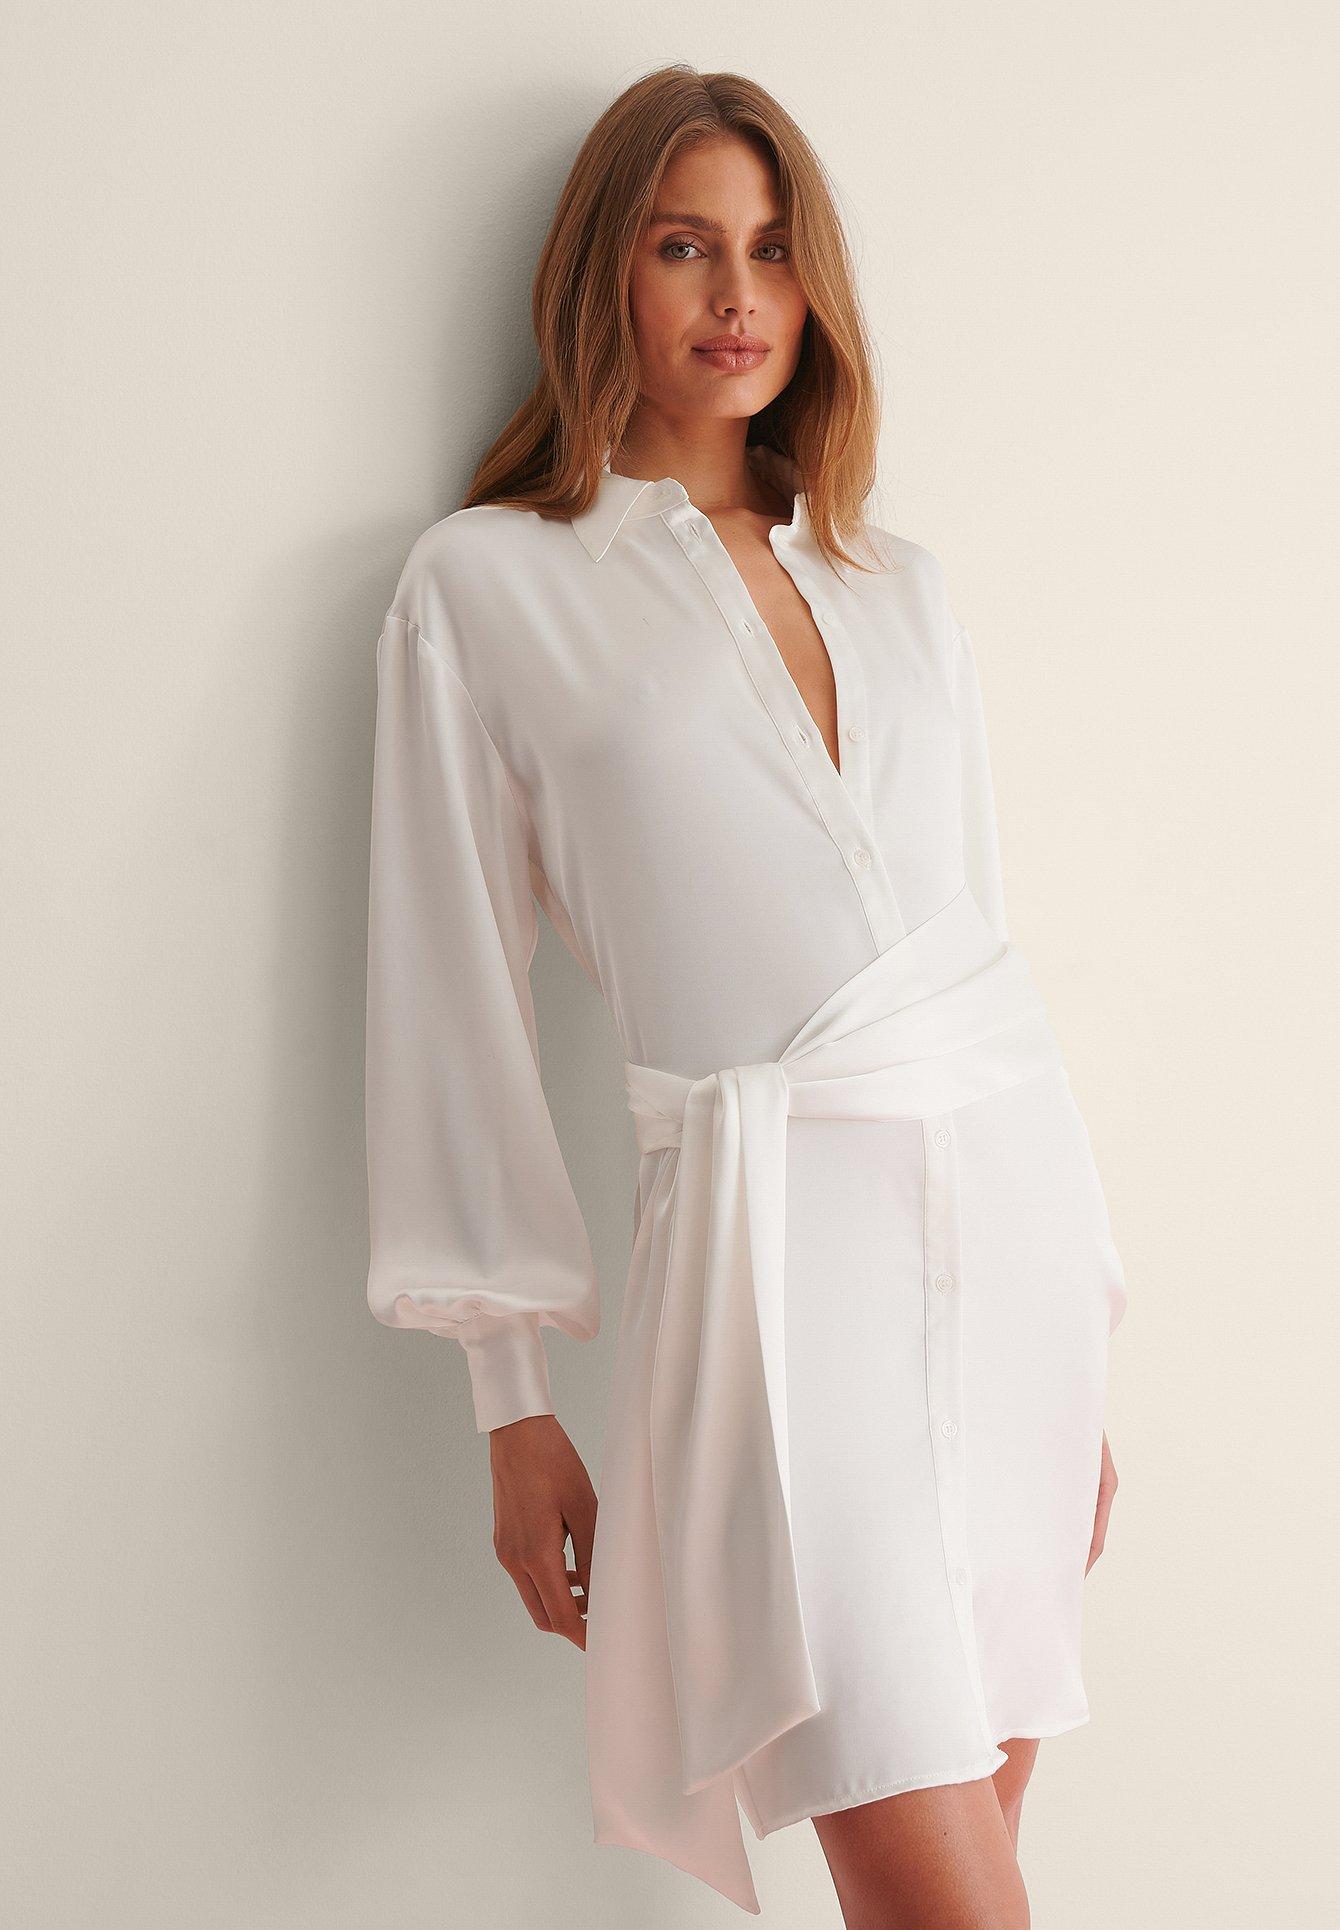 Donna FRONT KNOT SATIN SHIRT DRESS - Abito a camicia